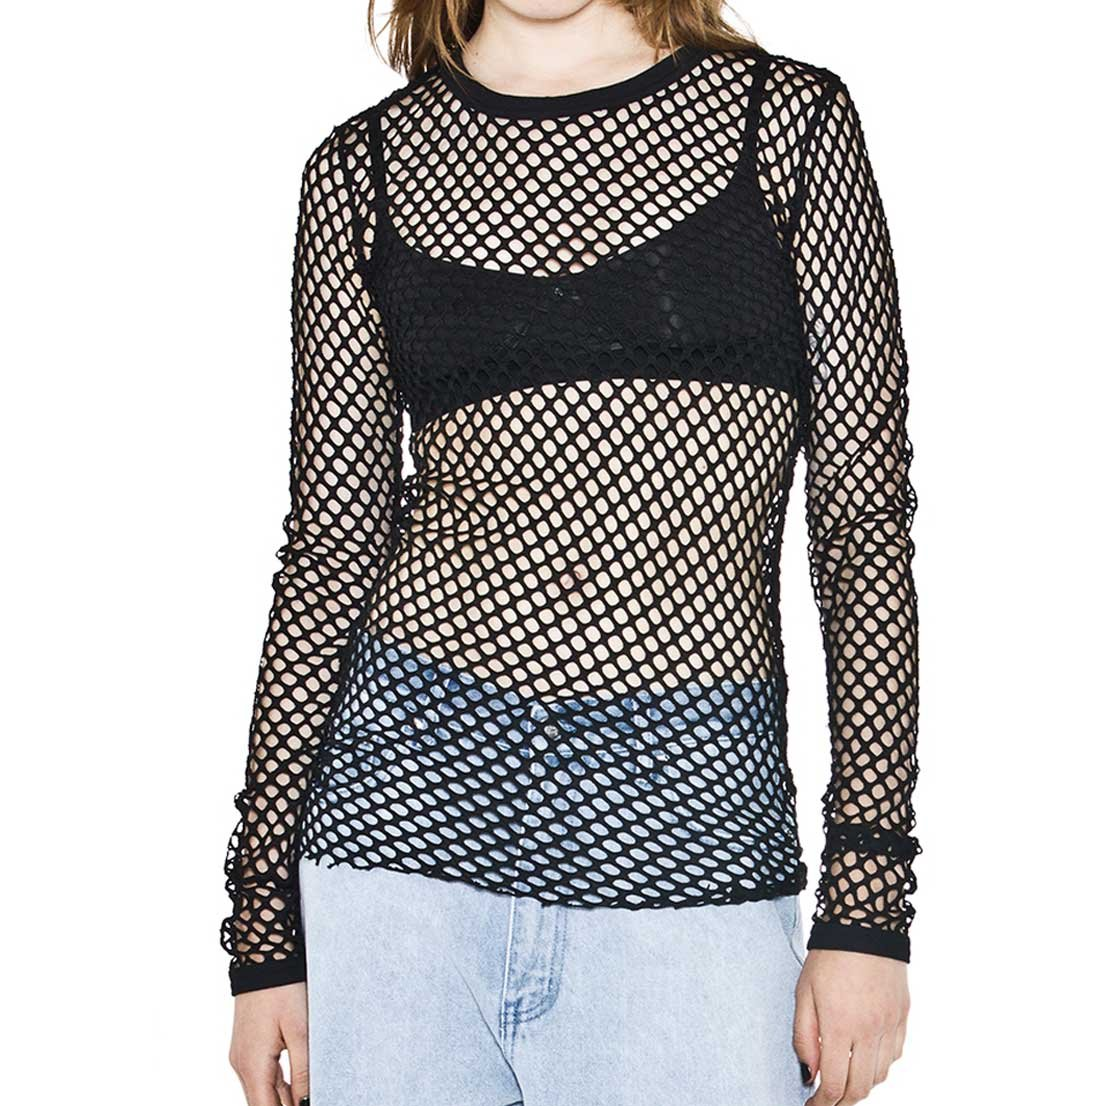 Cheapcotton Women's Black Long-Sleeved Fishnet Top